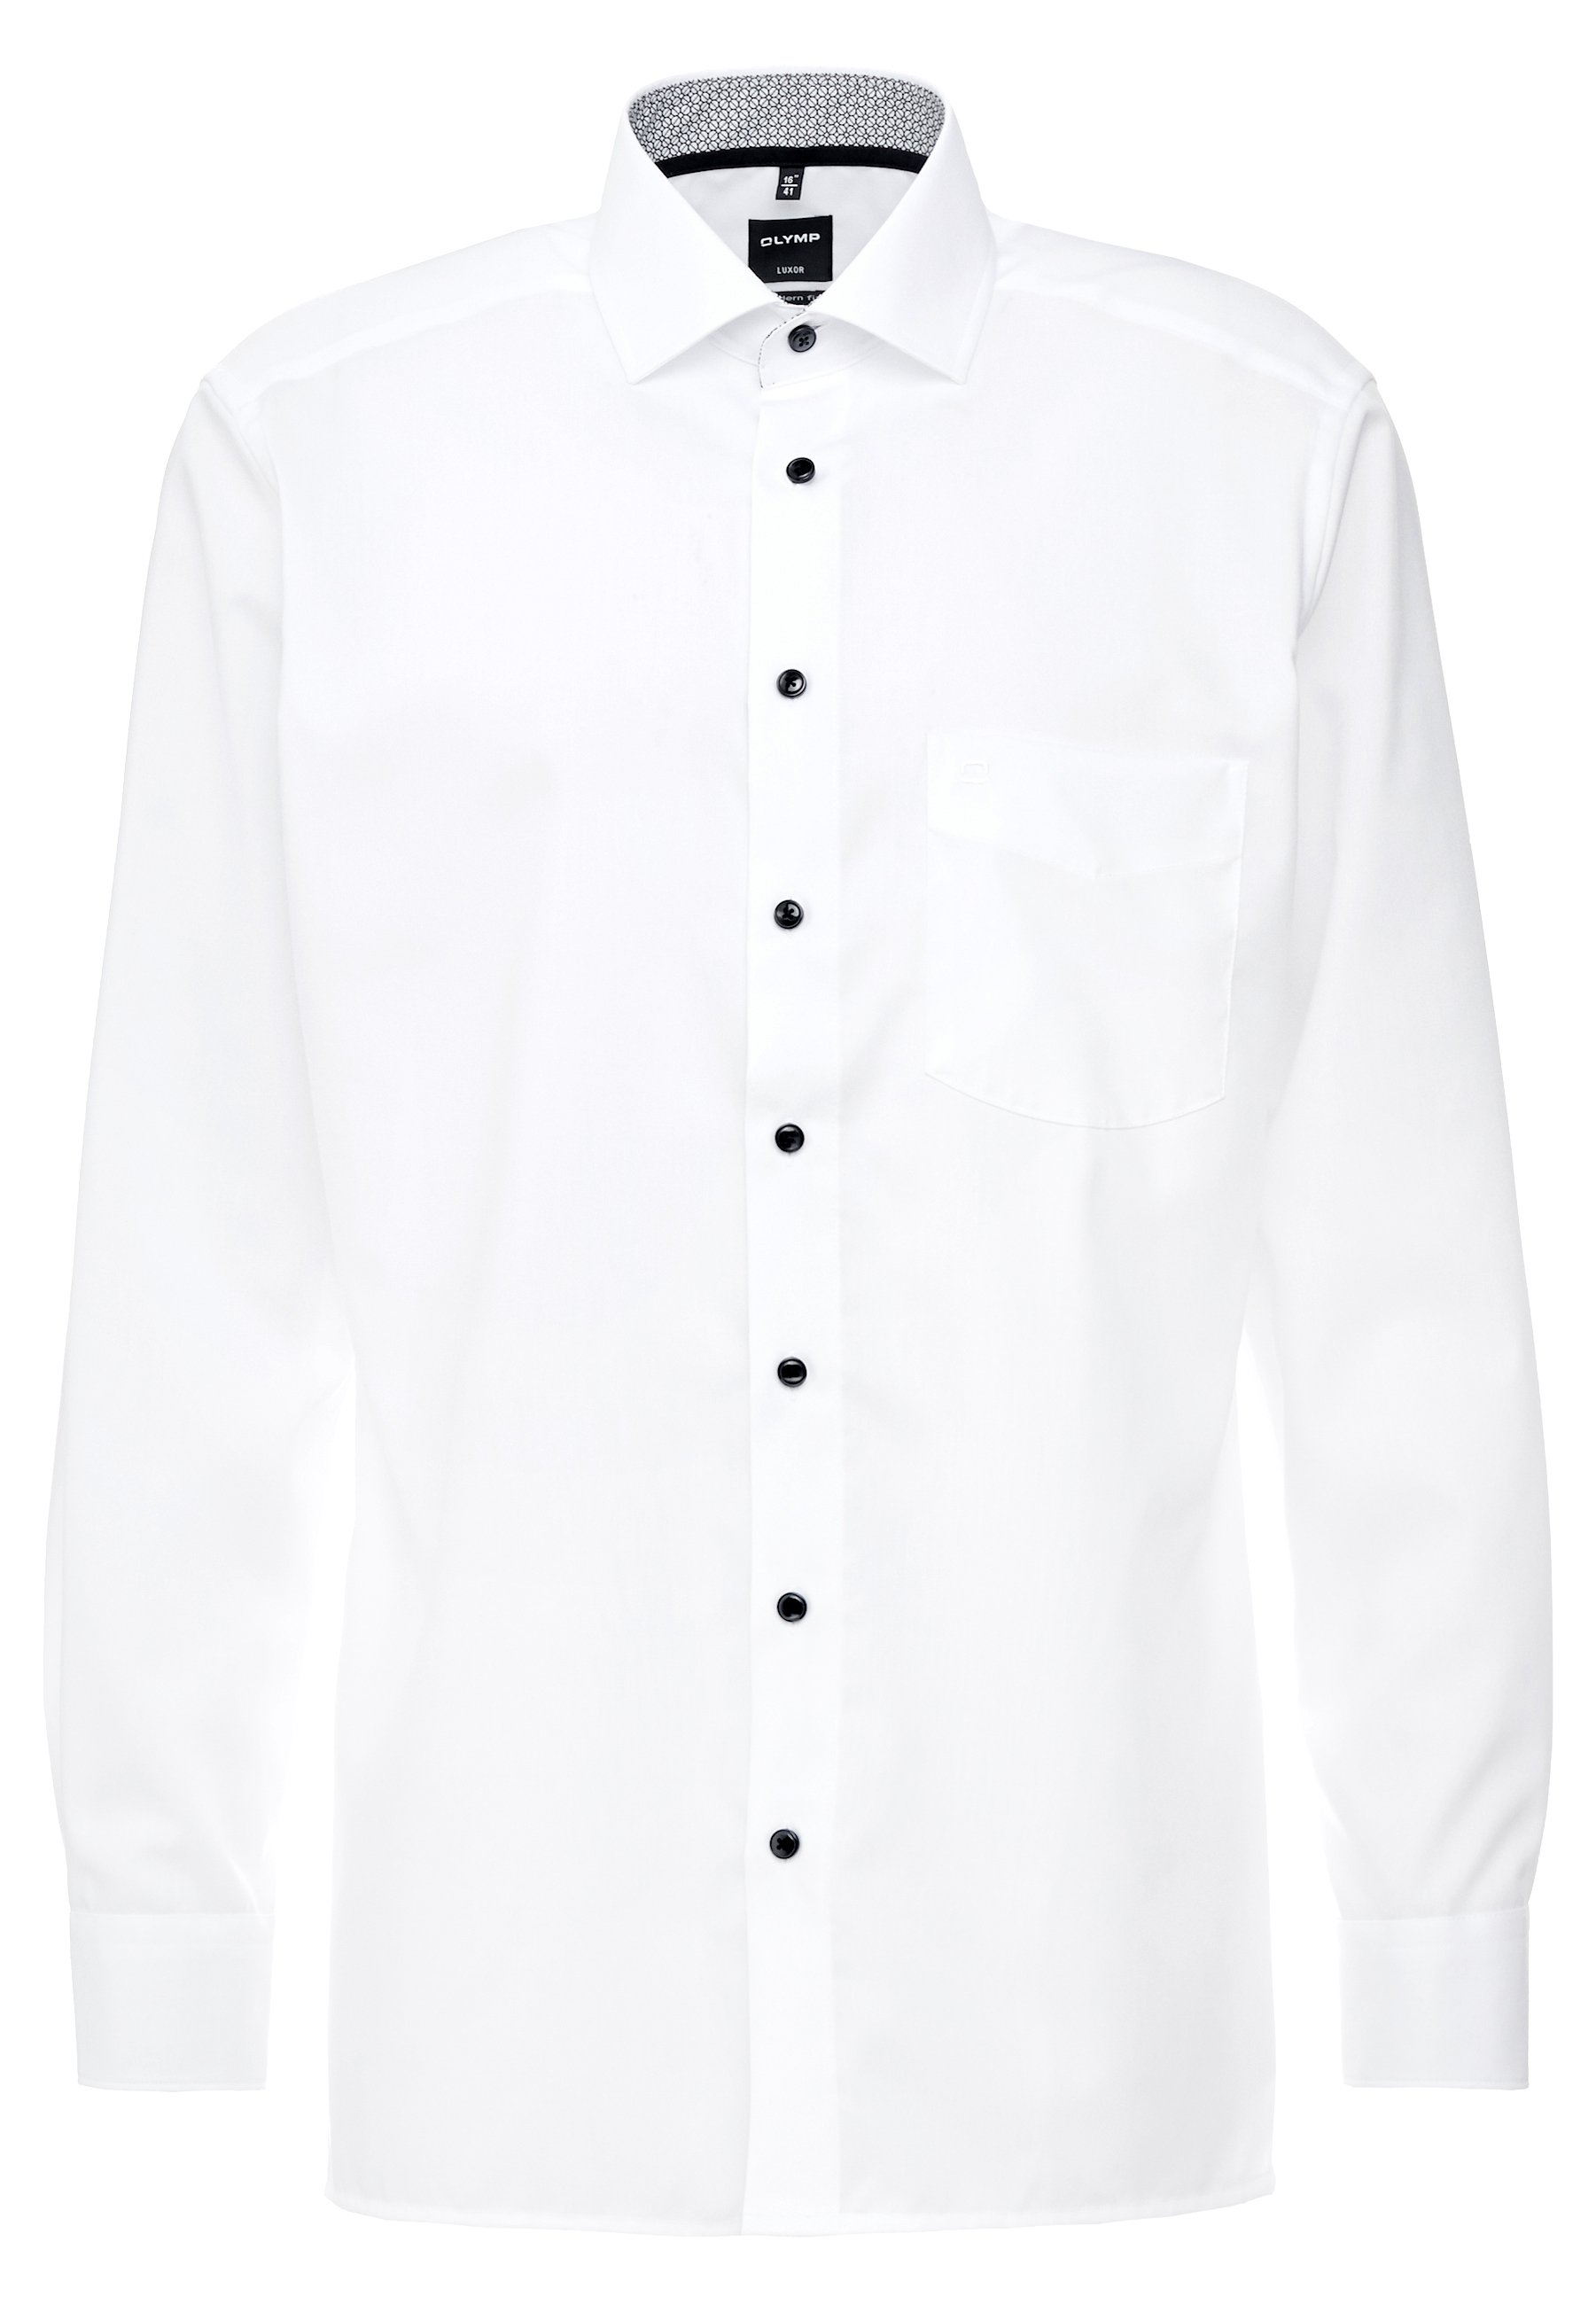 OLYMP OLYMP LUXOR MODERN FIT - Koszula biznesowa - anthrazit